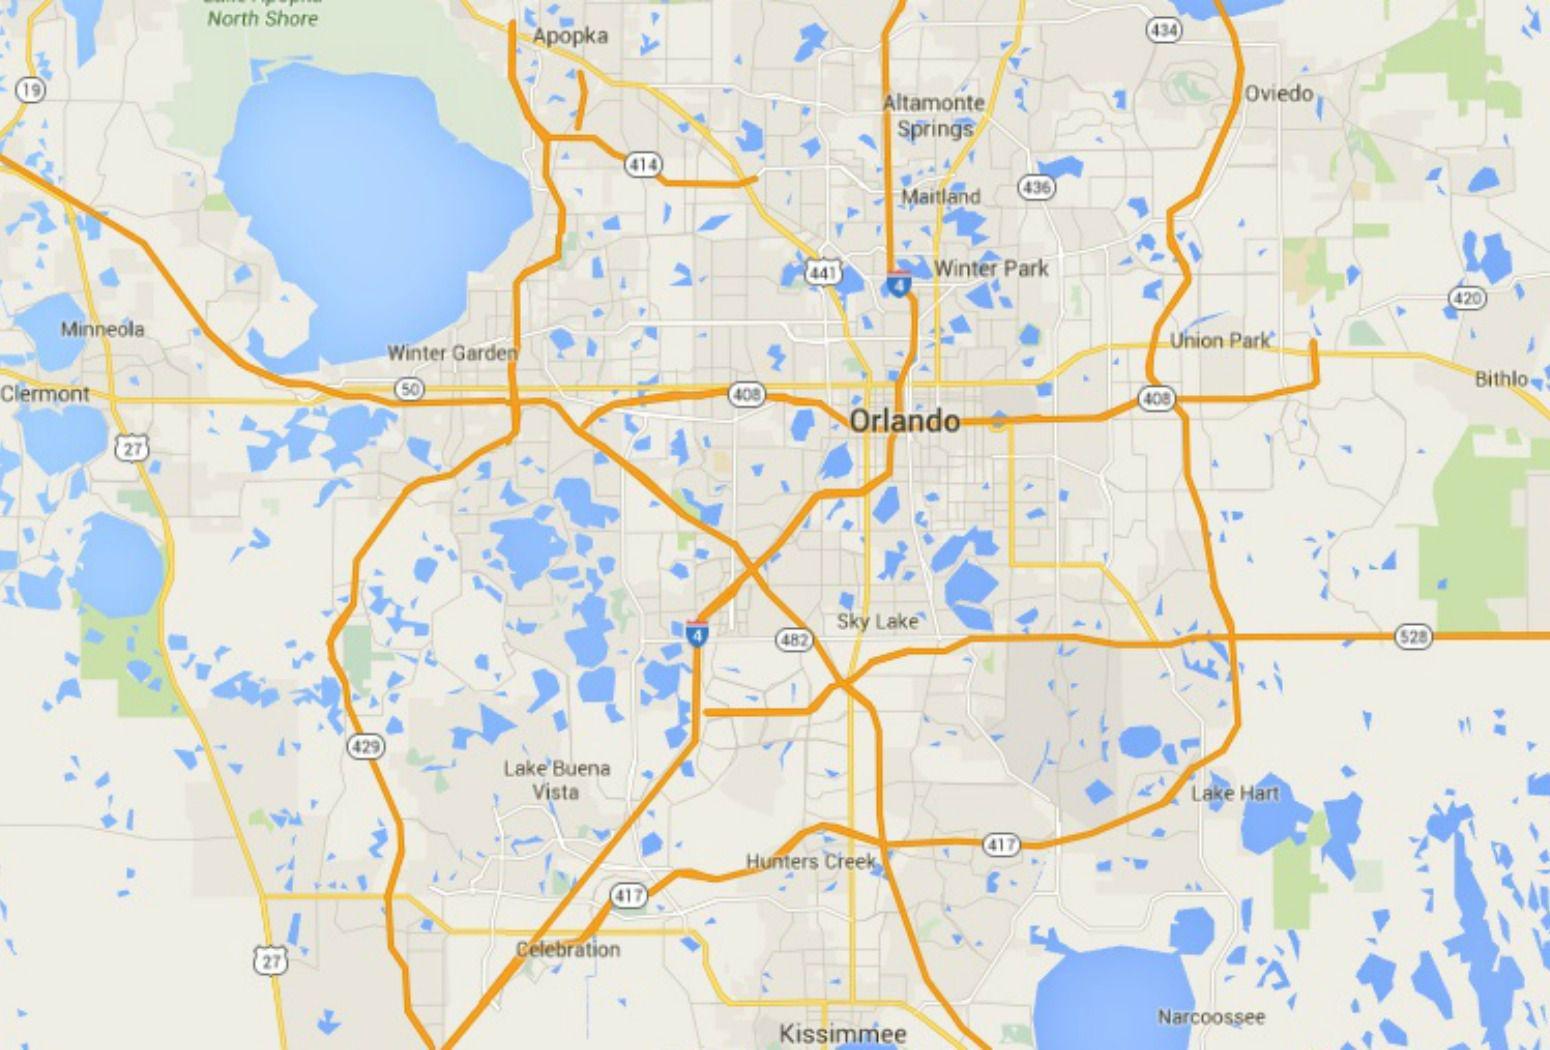 . maps of florida orlando tampa miami keys and more